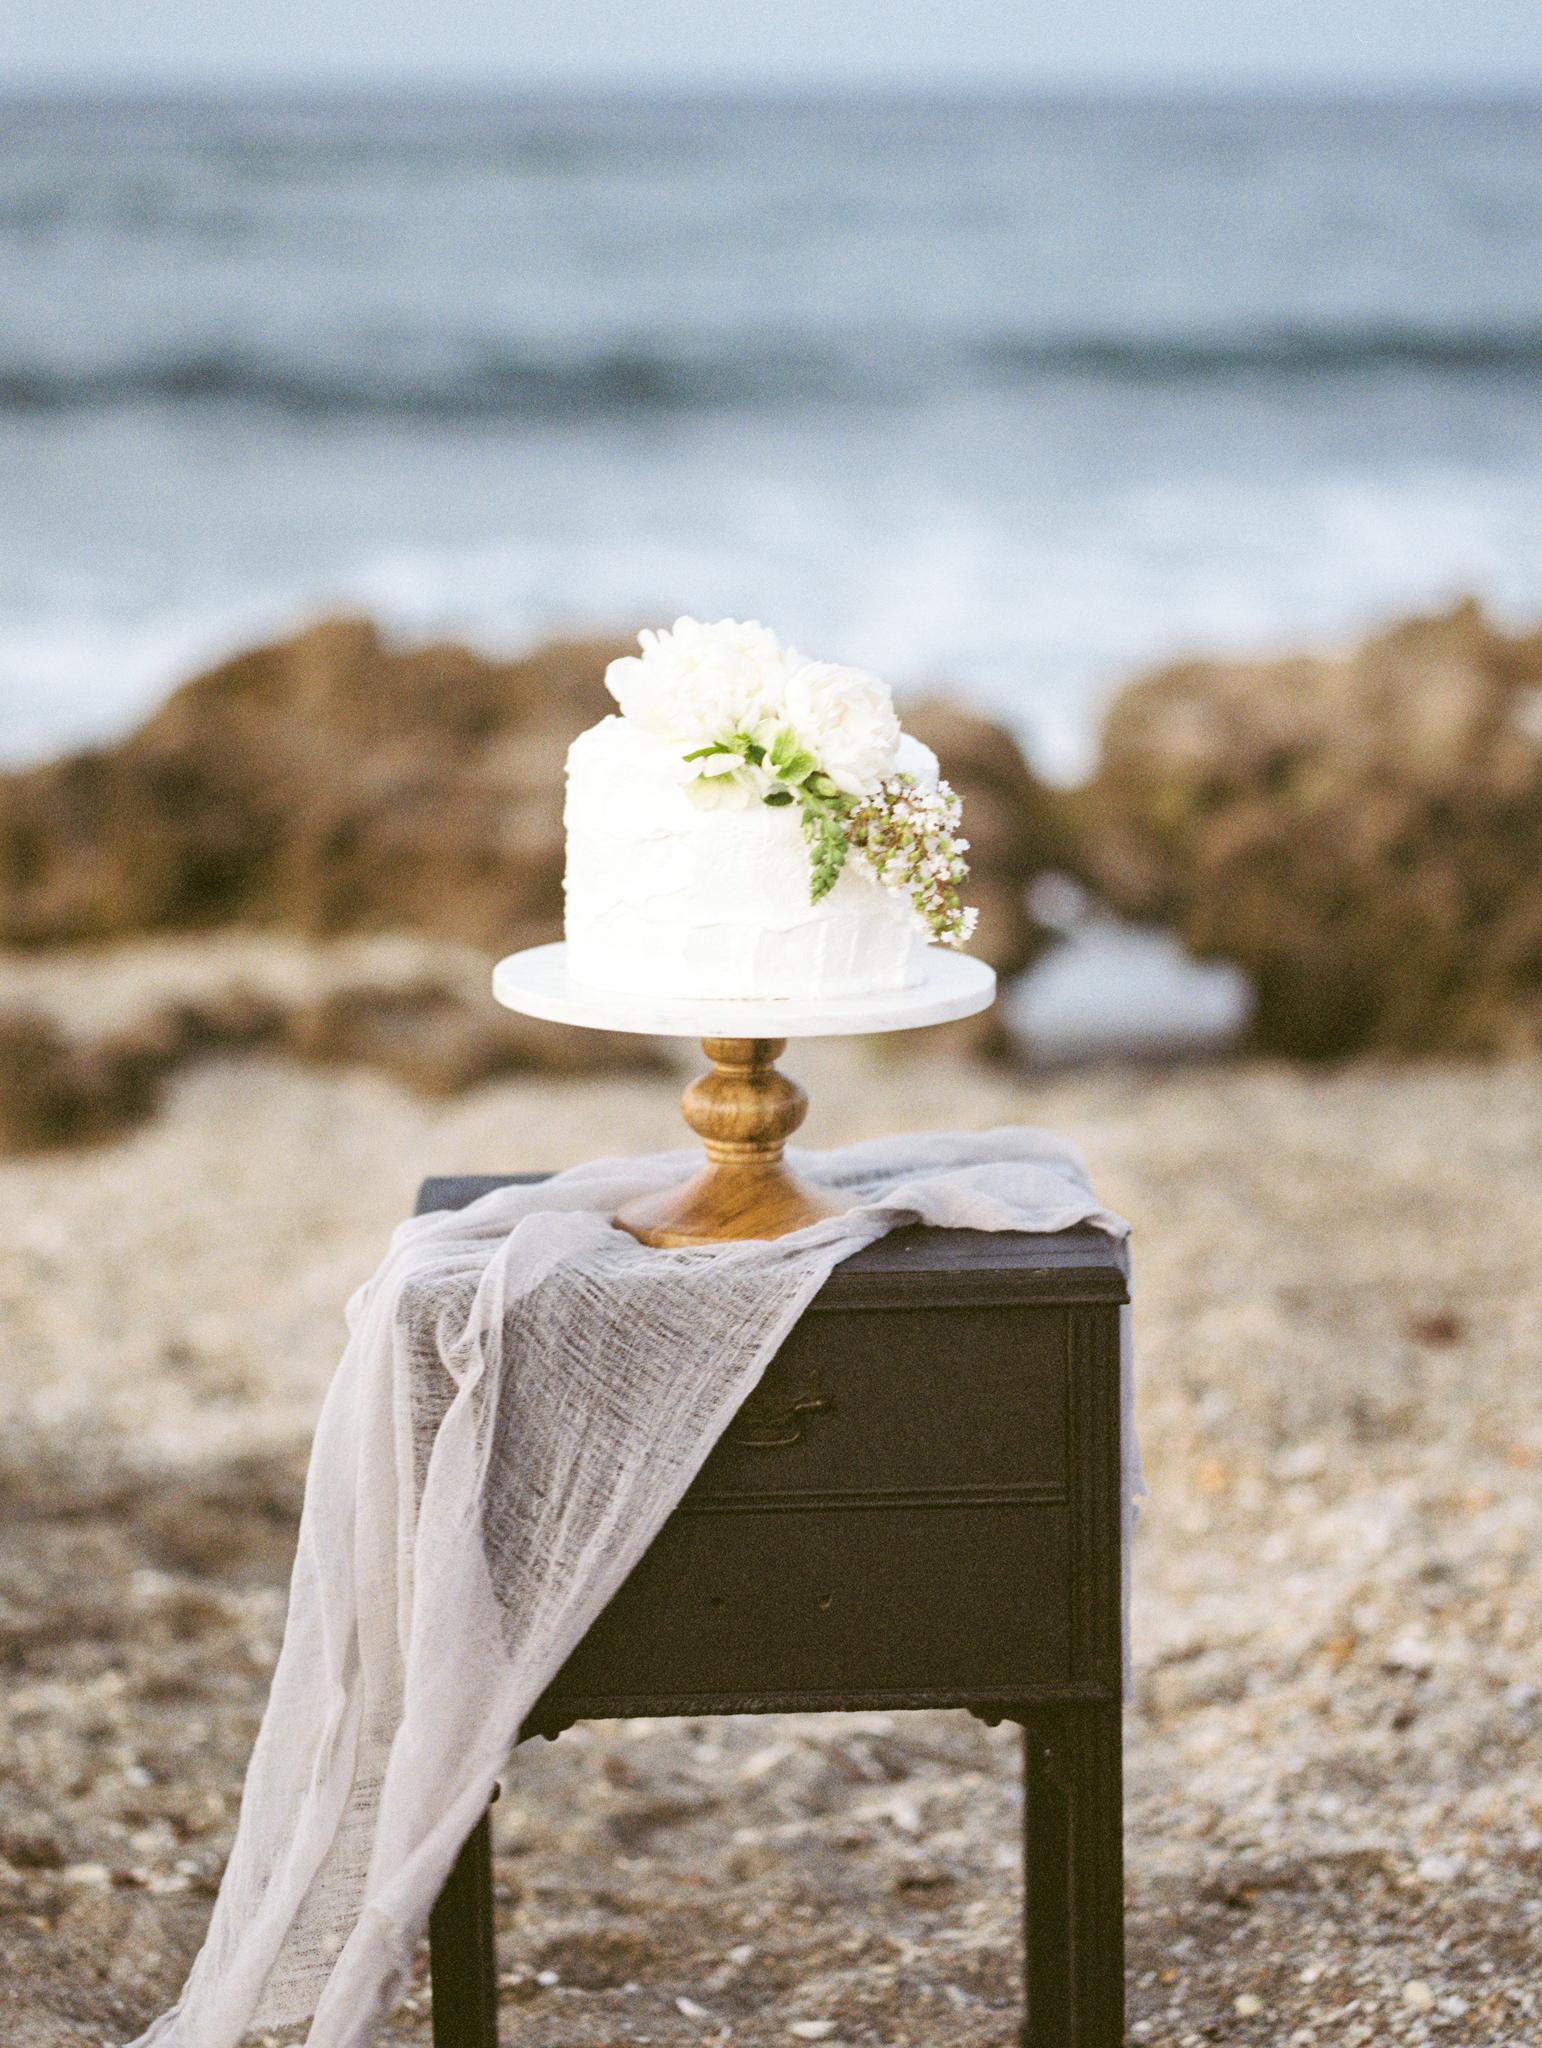 coral cove, jupiter beach FL, palm beach wedding photos, wedding cake from publix